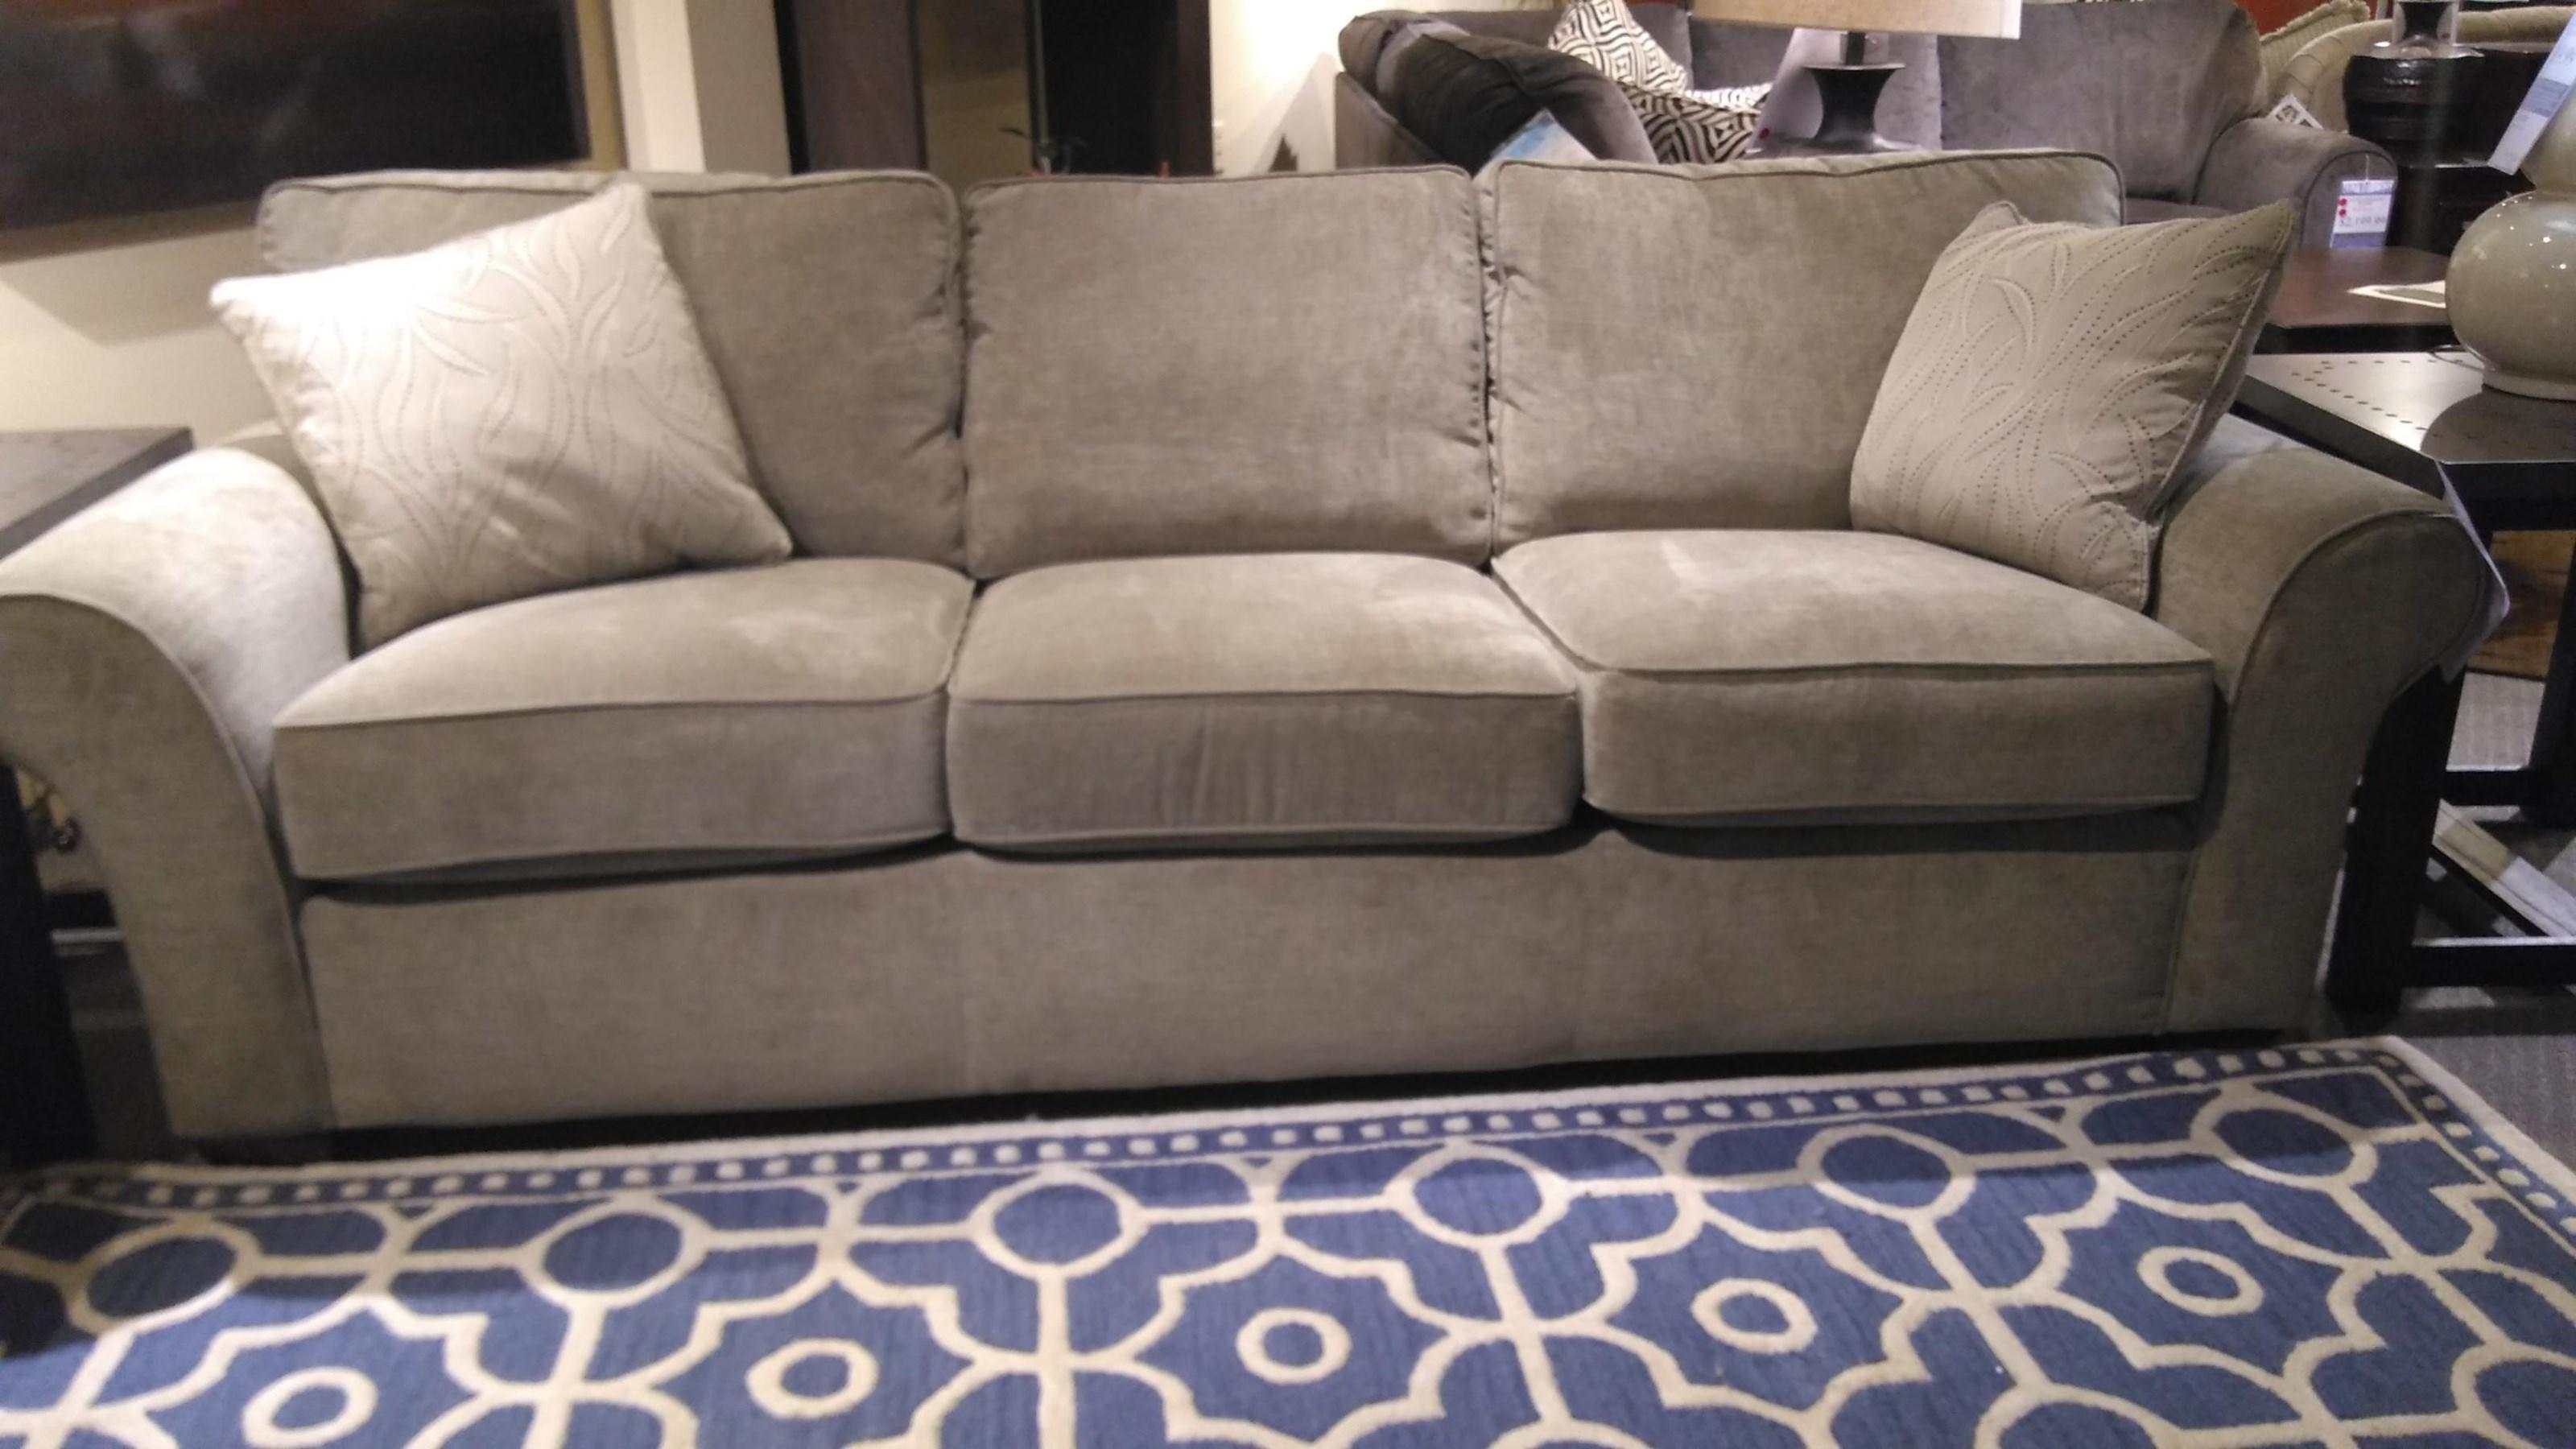 ... Three Cushion Sofa. Flexsteel Vail91; Flexsteel Vail91 ...